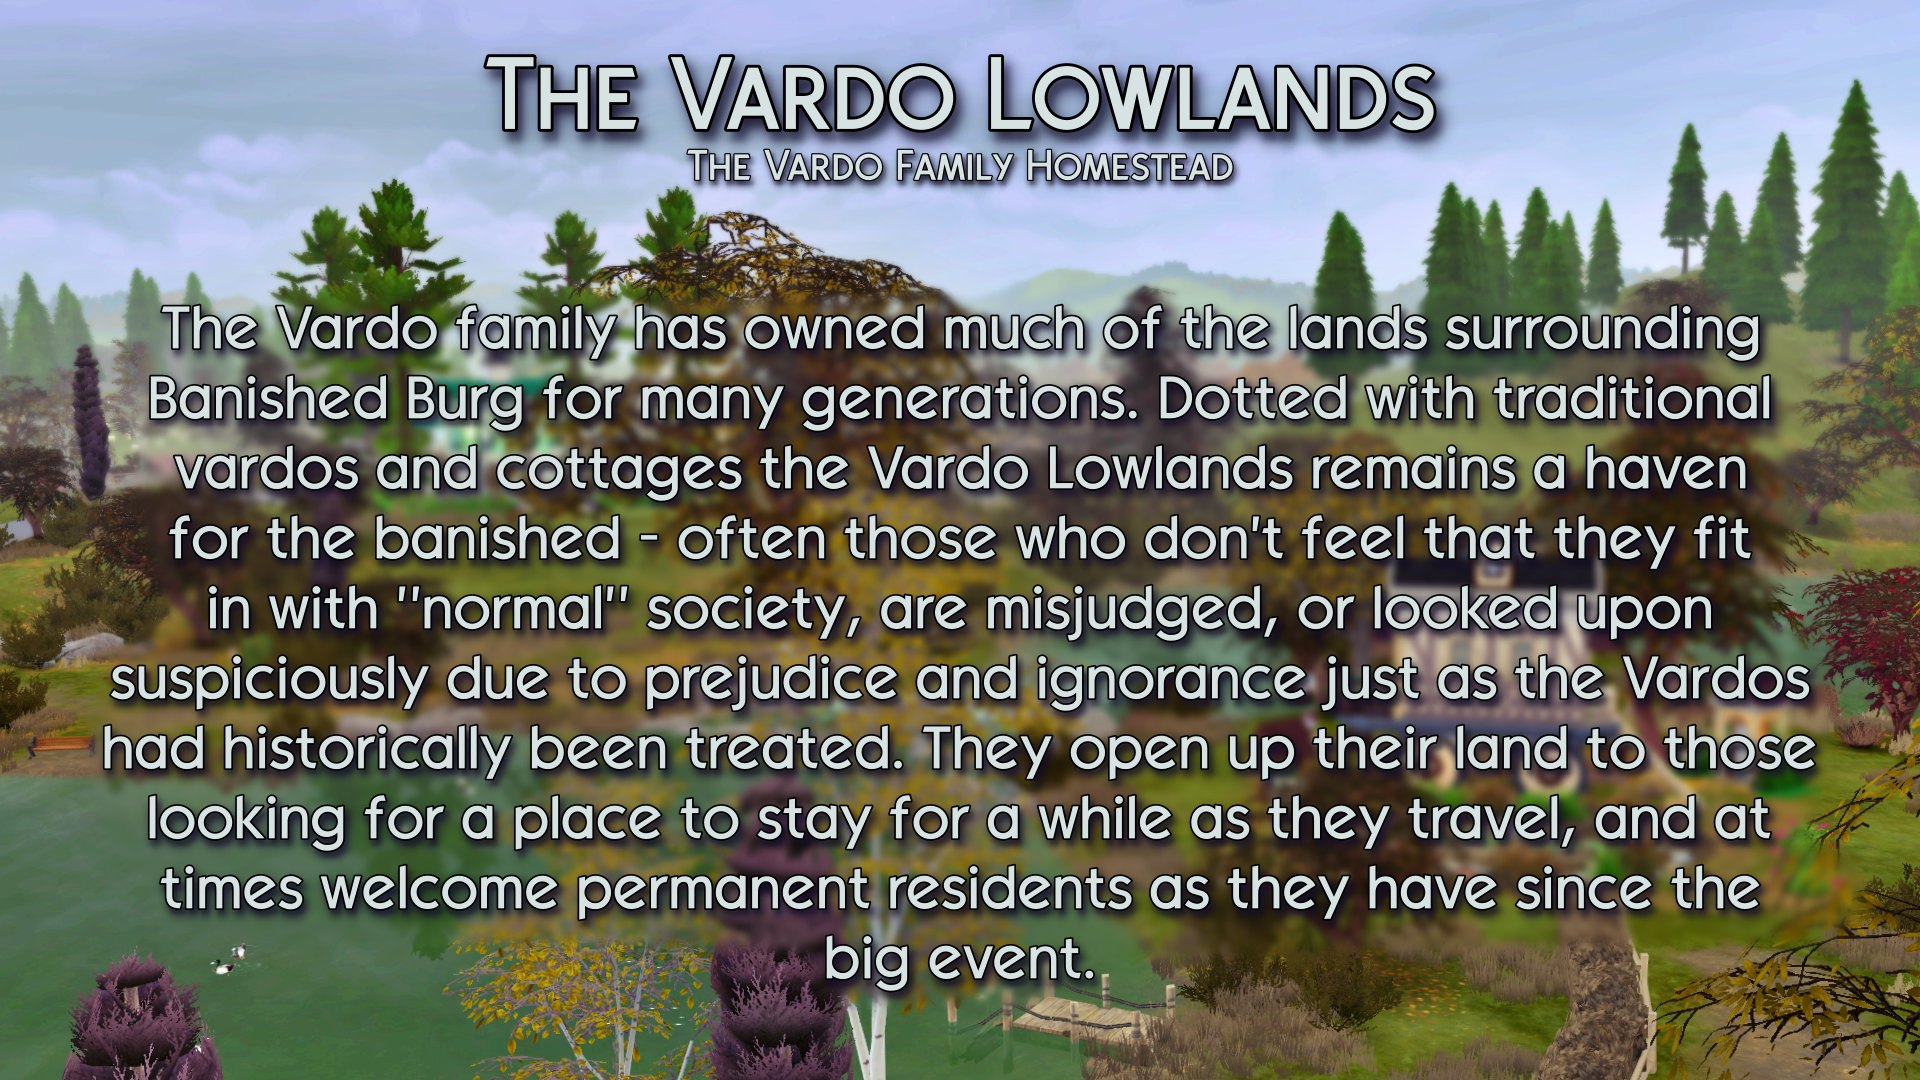 3 Vardo Lowlands